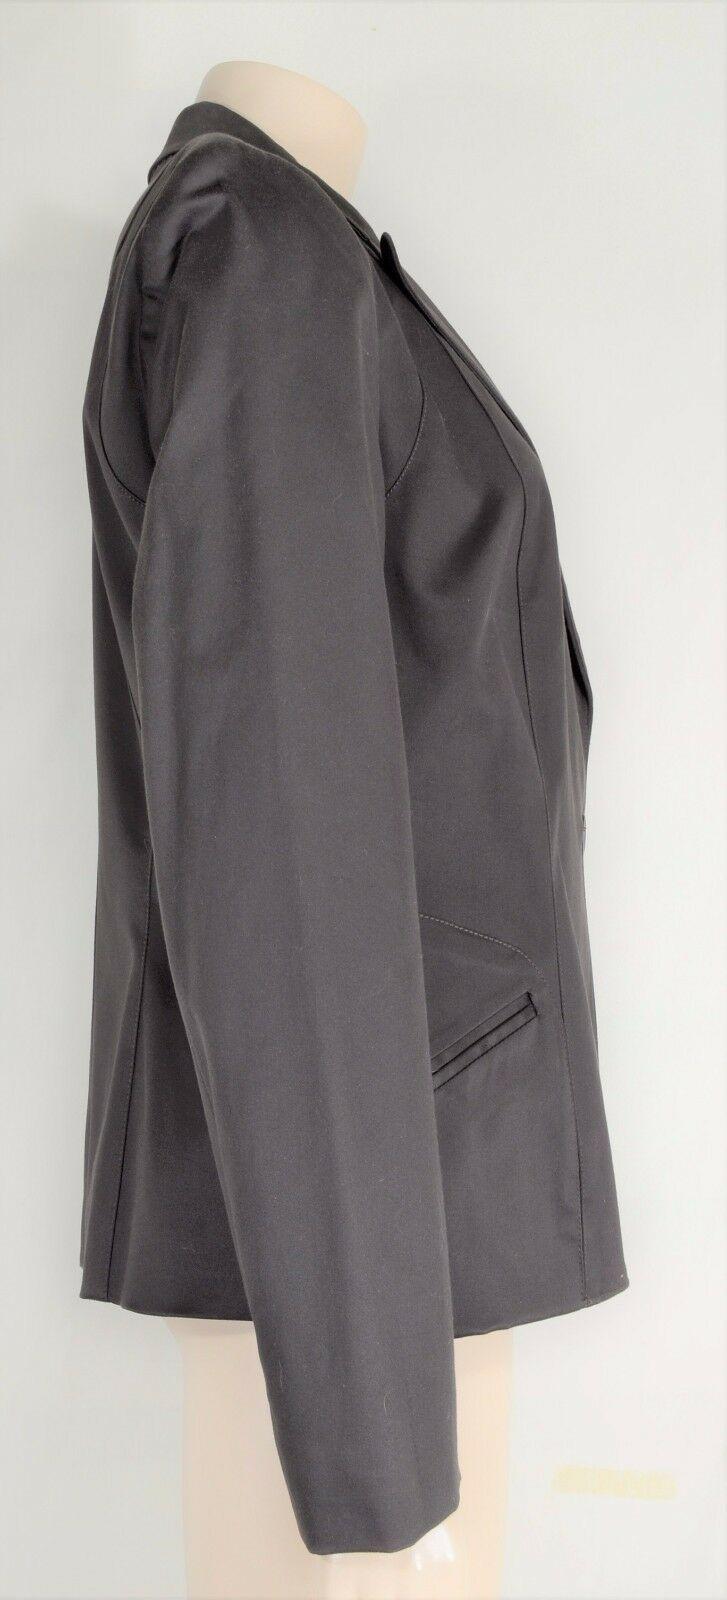 womyn jacket coat NWT SZ 8 dark brown 1-button closure lined NYC USA new image 9